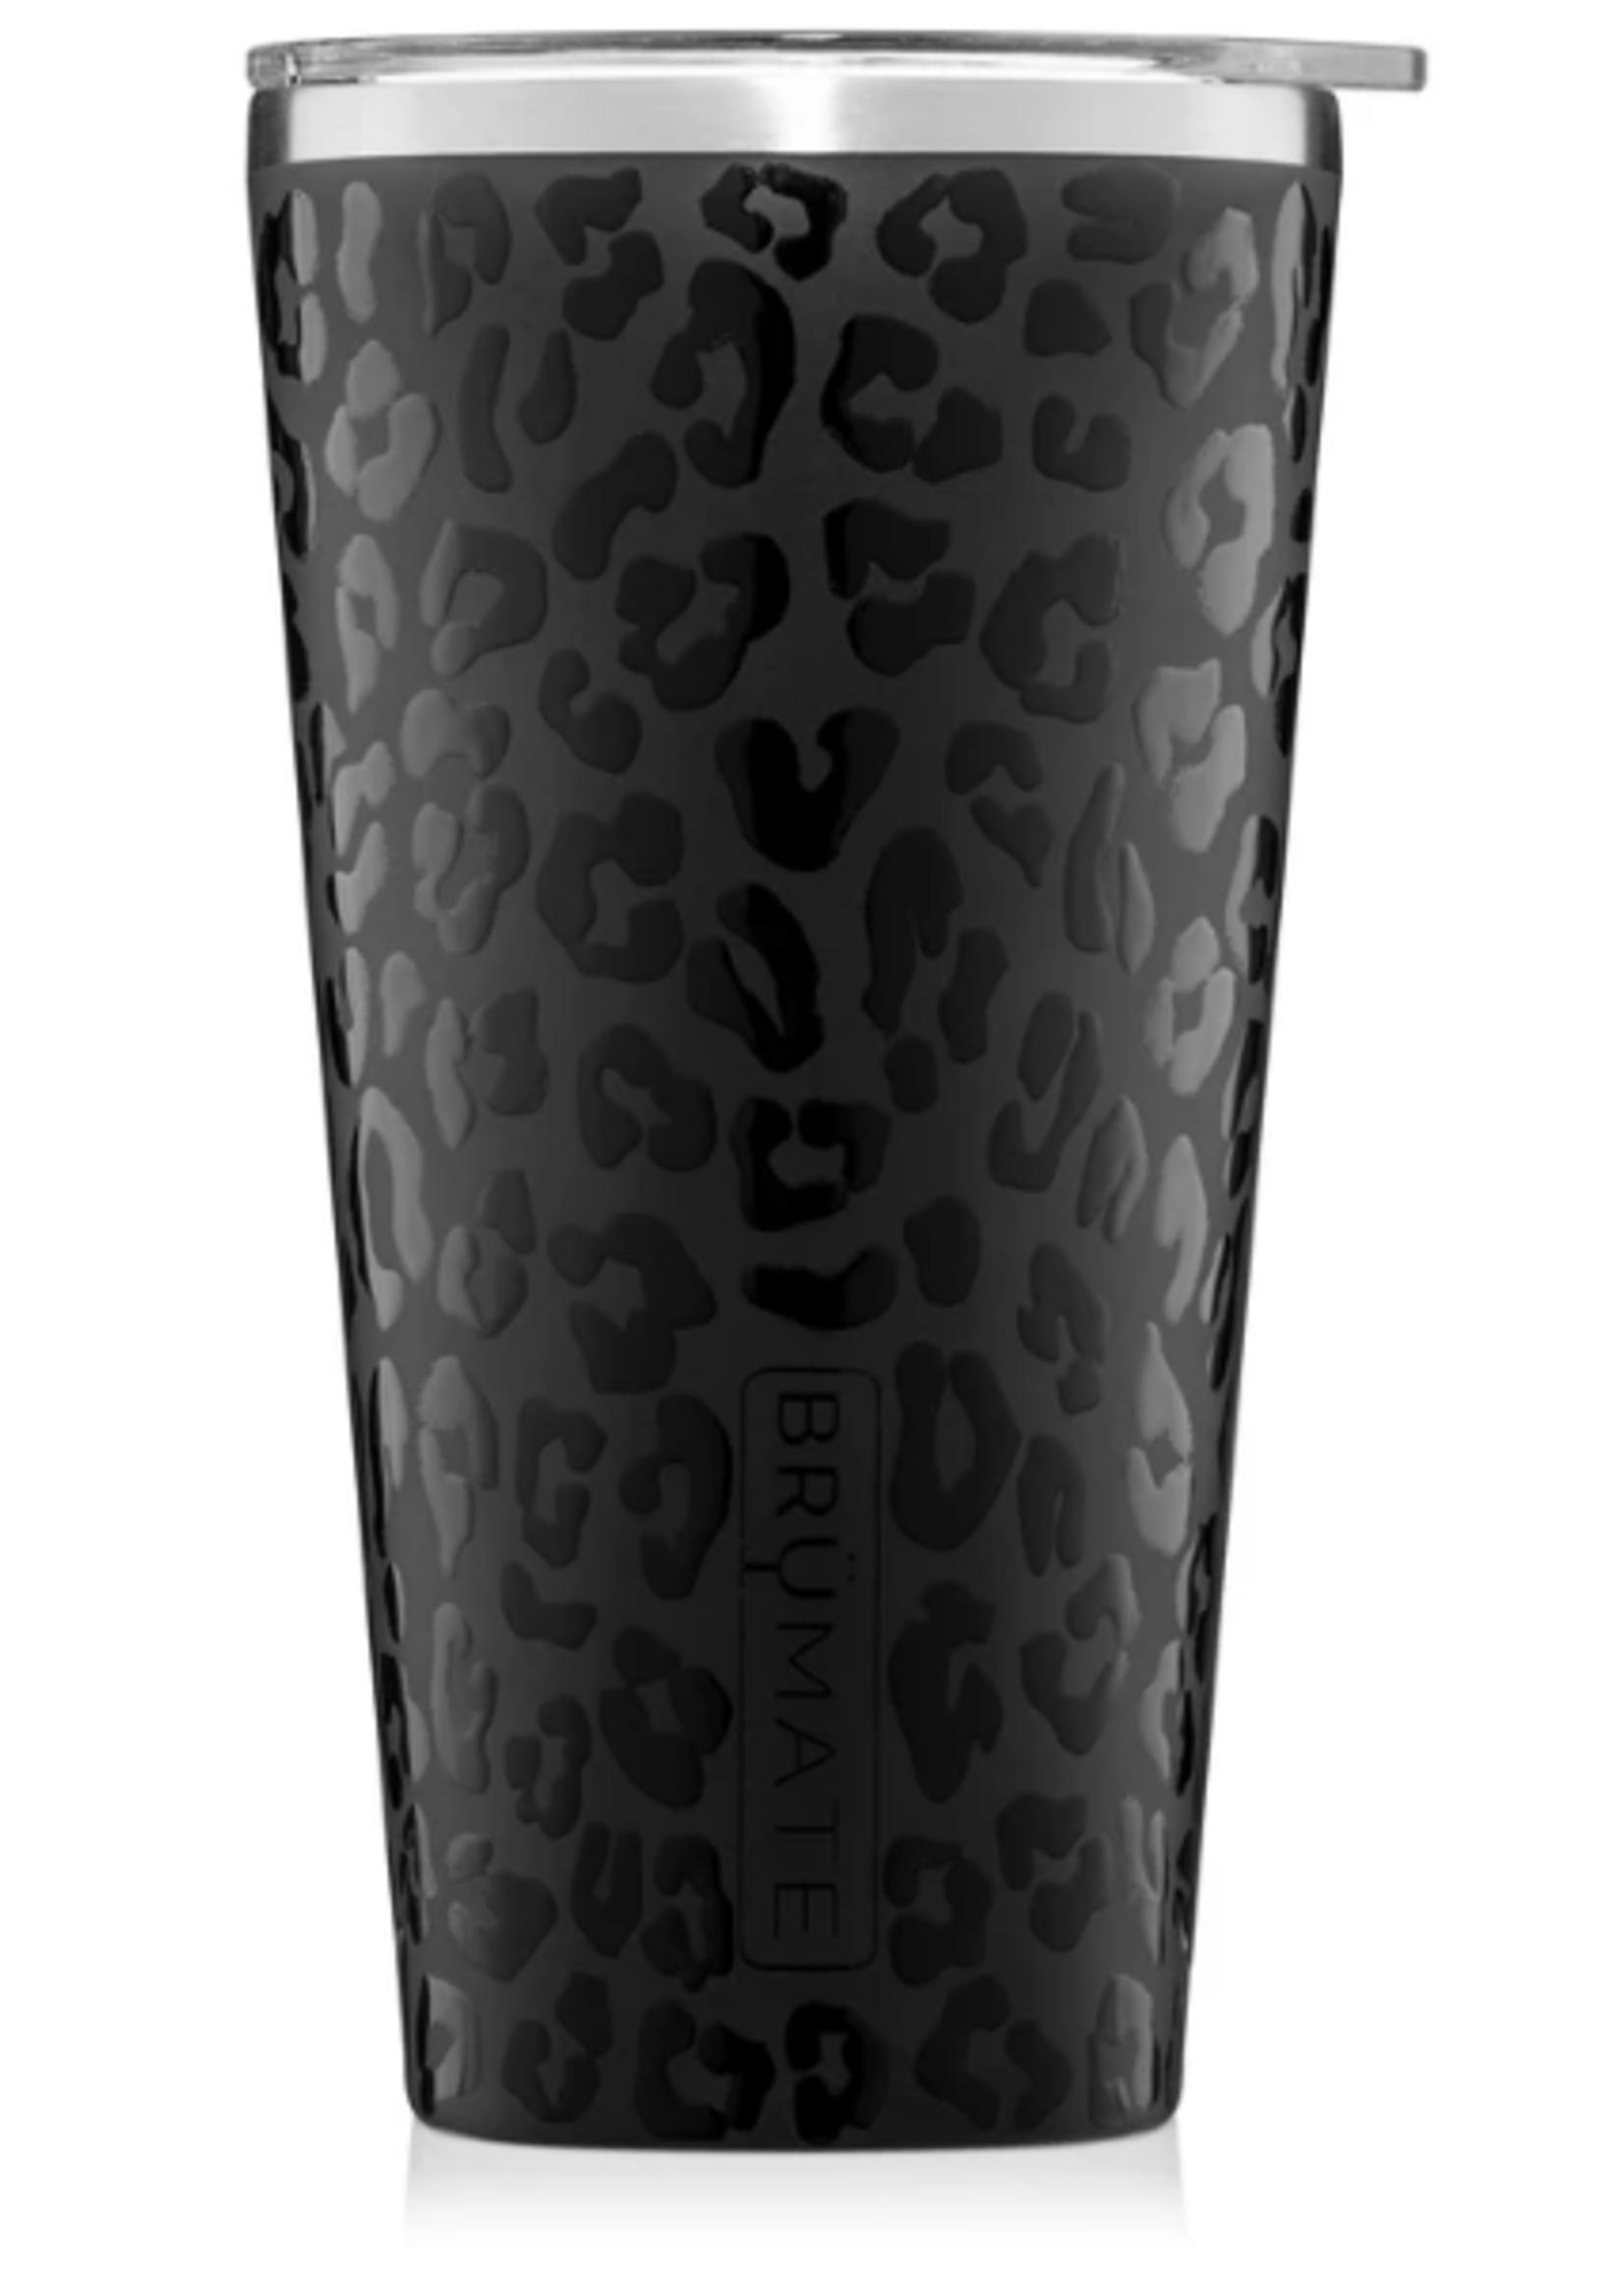 Brumate 20oz Imperial Pint - Onyx Leopard